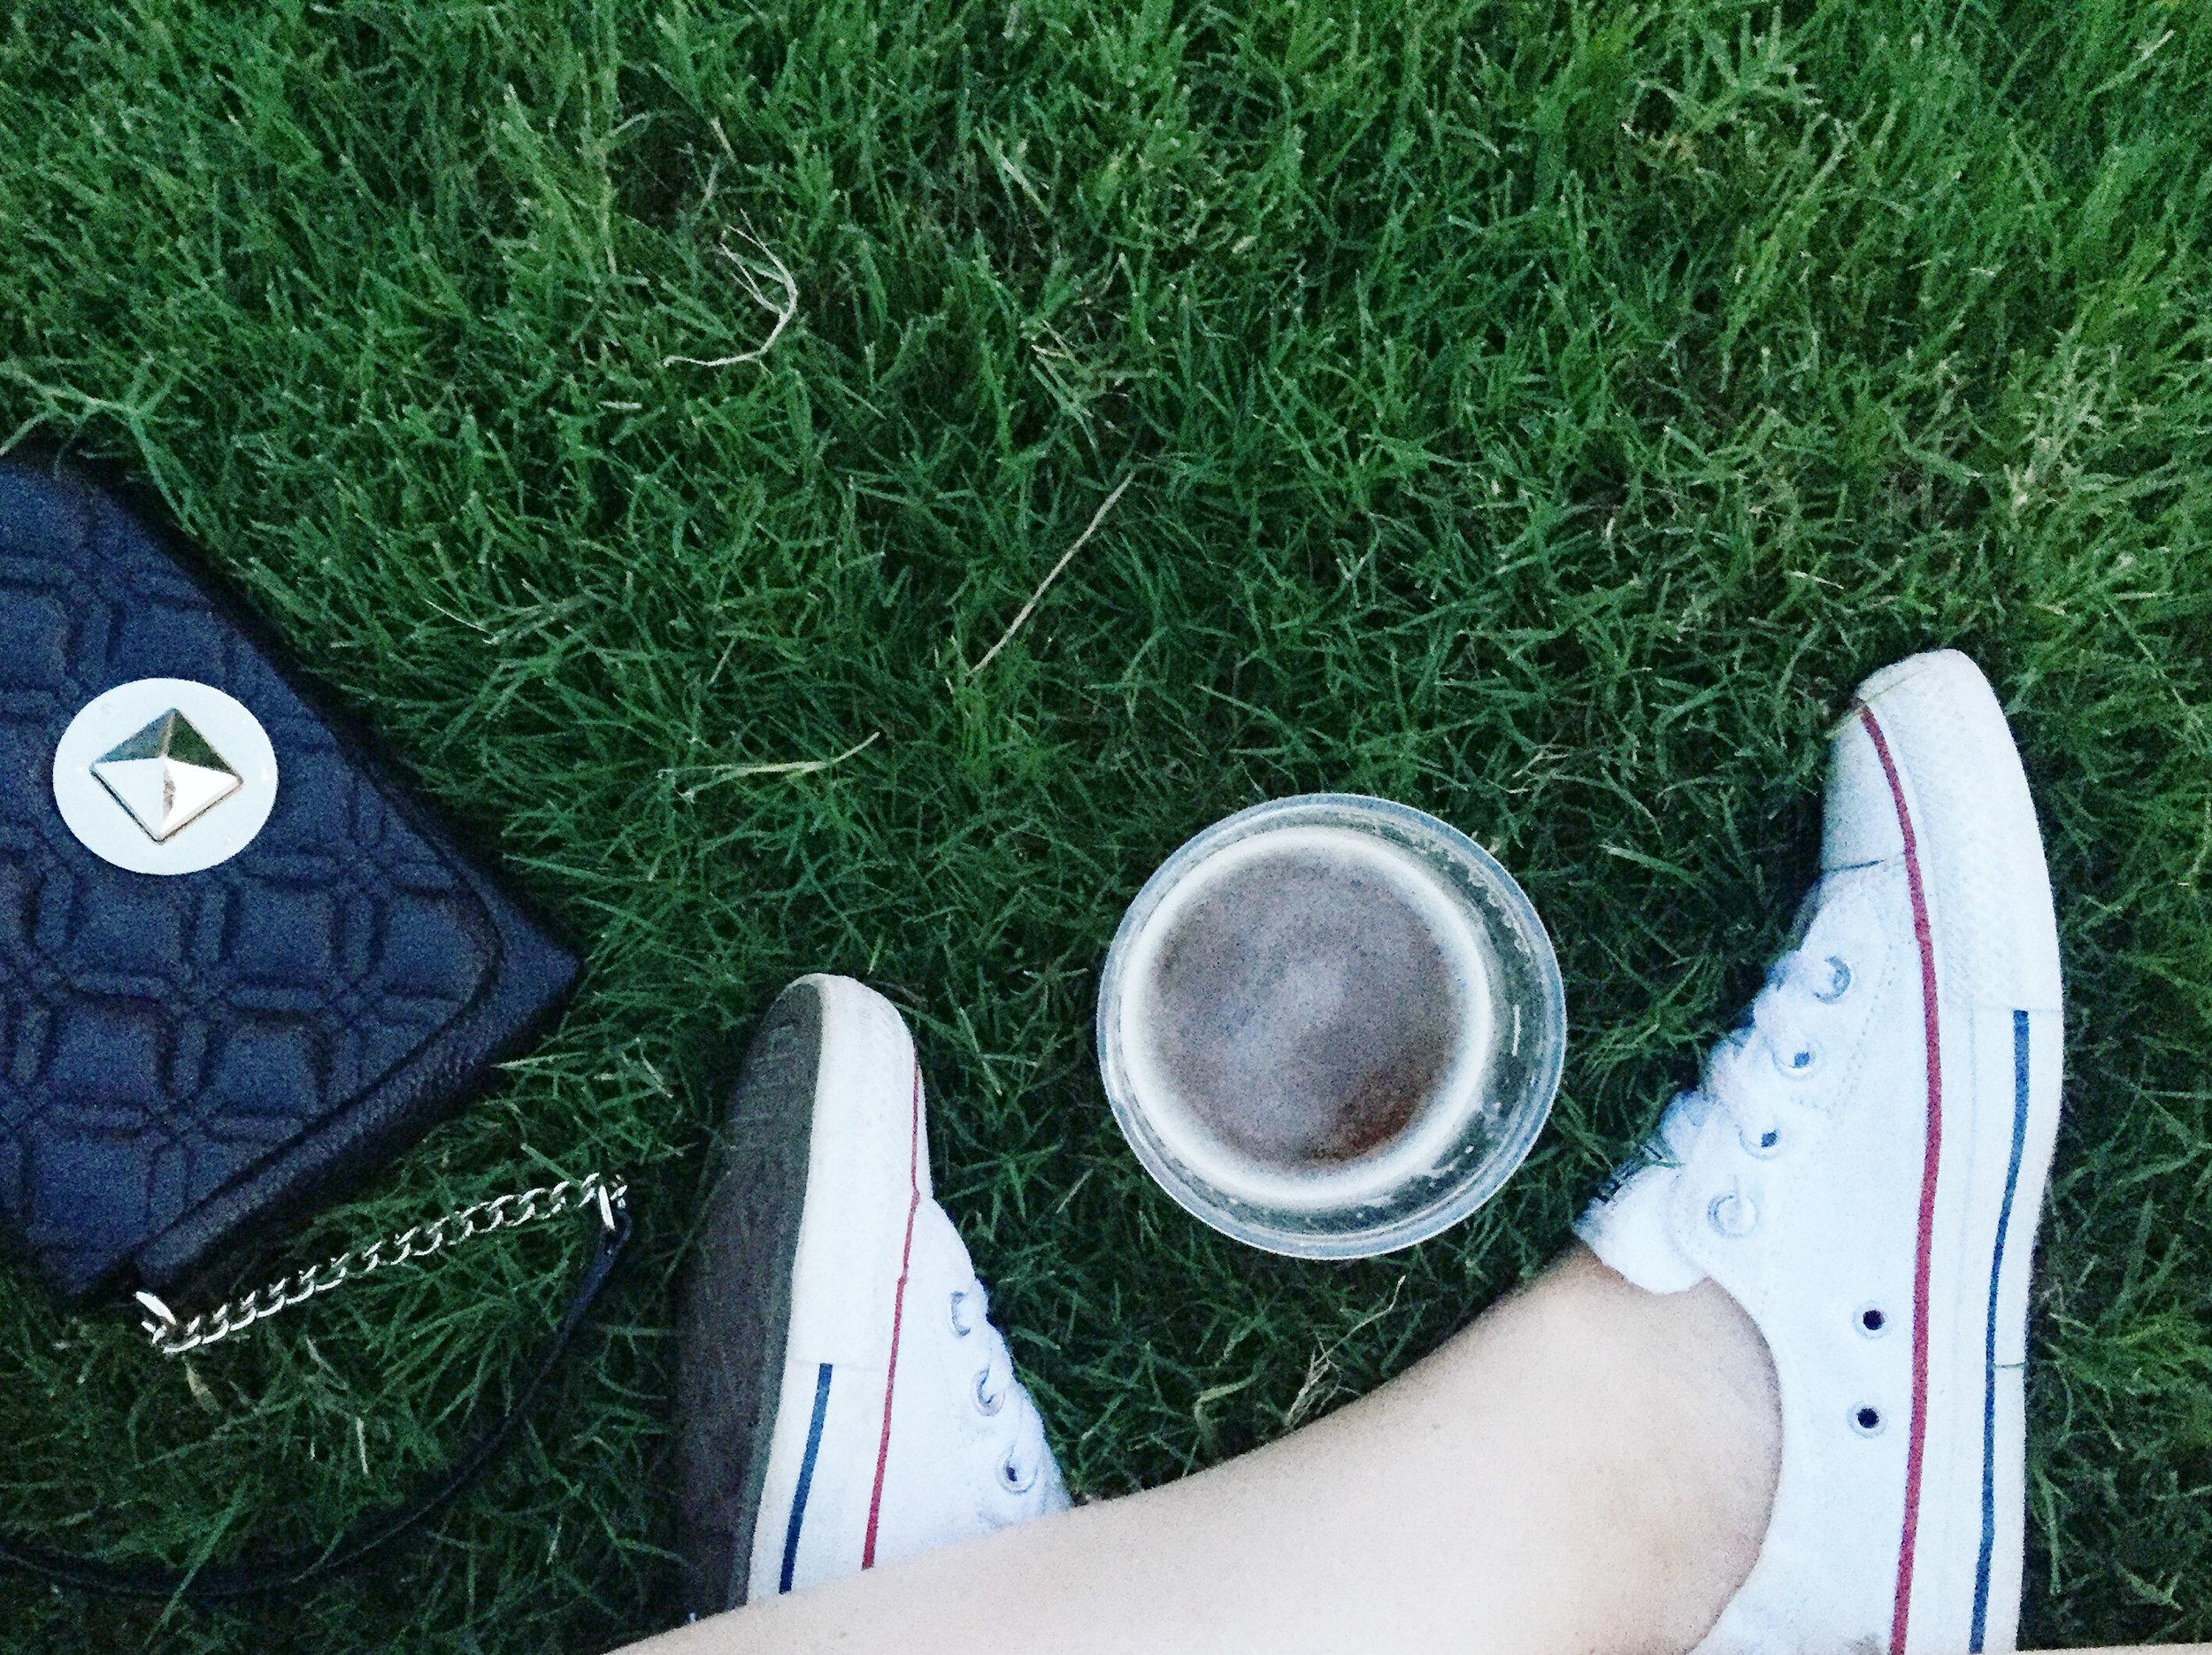 chucks-concert-craft-beer-pnc-charlotte-nc